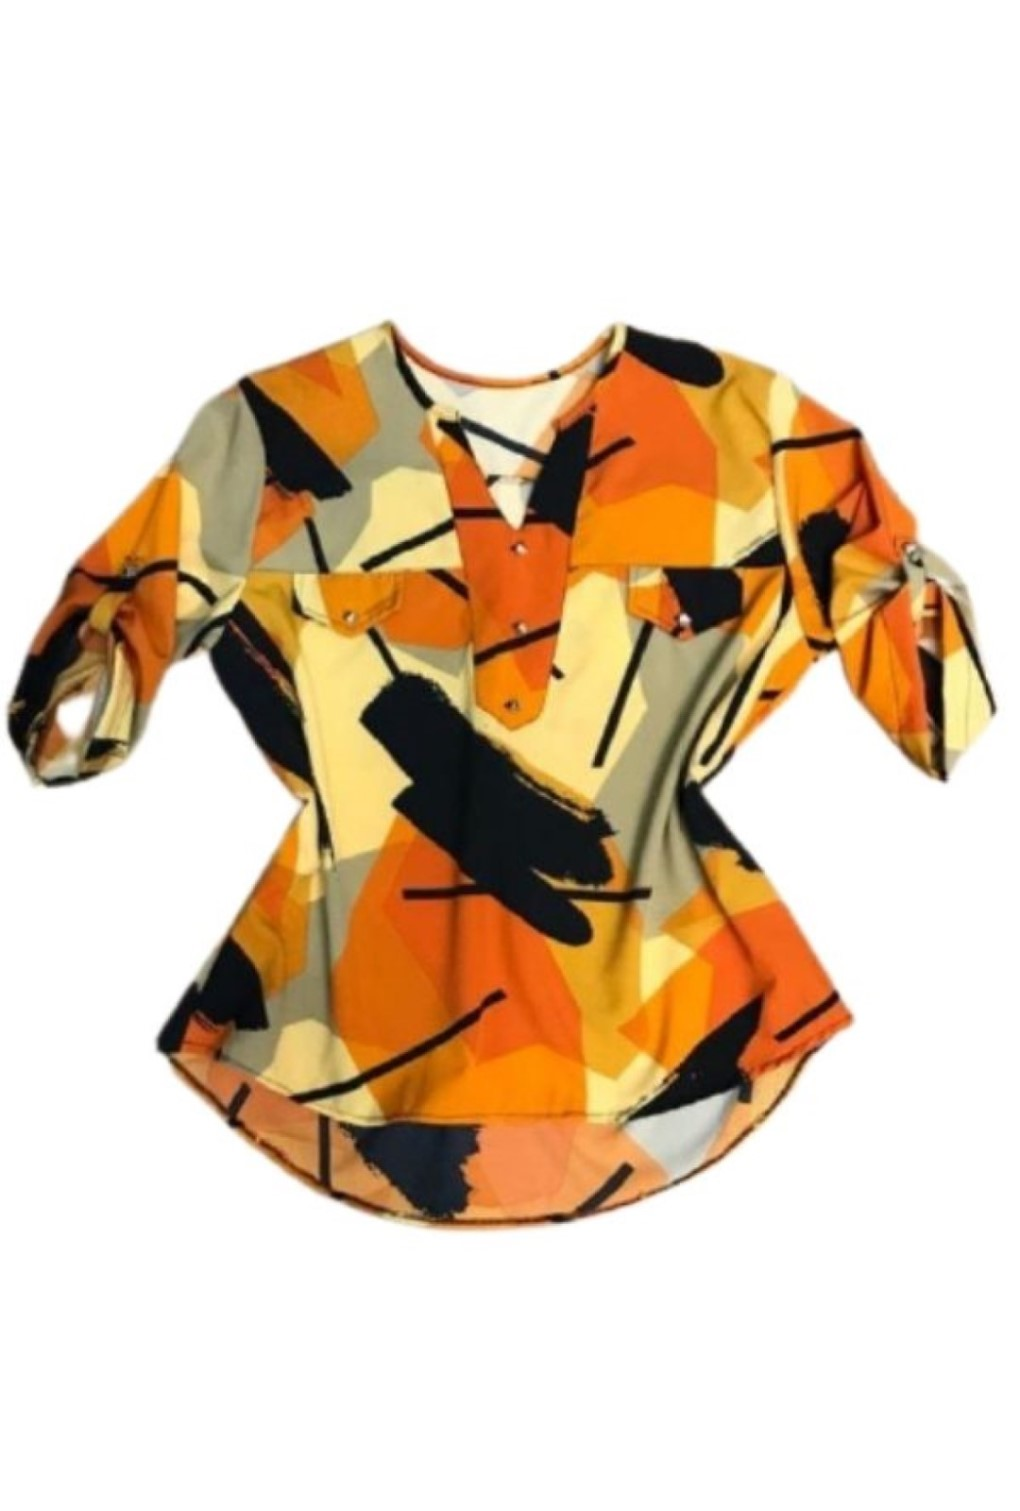 Camisa Blusa Feminina Manga Curta Social Sport Estampada Amarela  - ModaStore